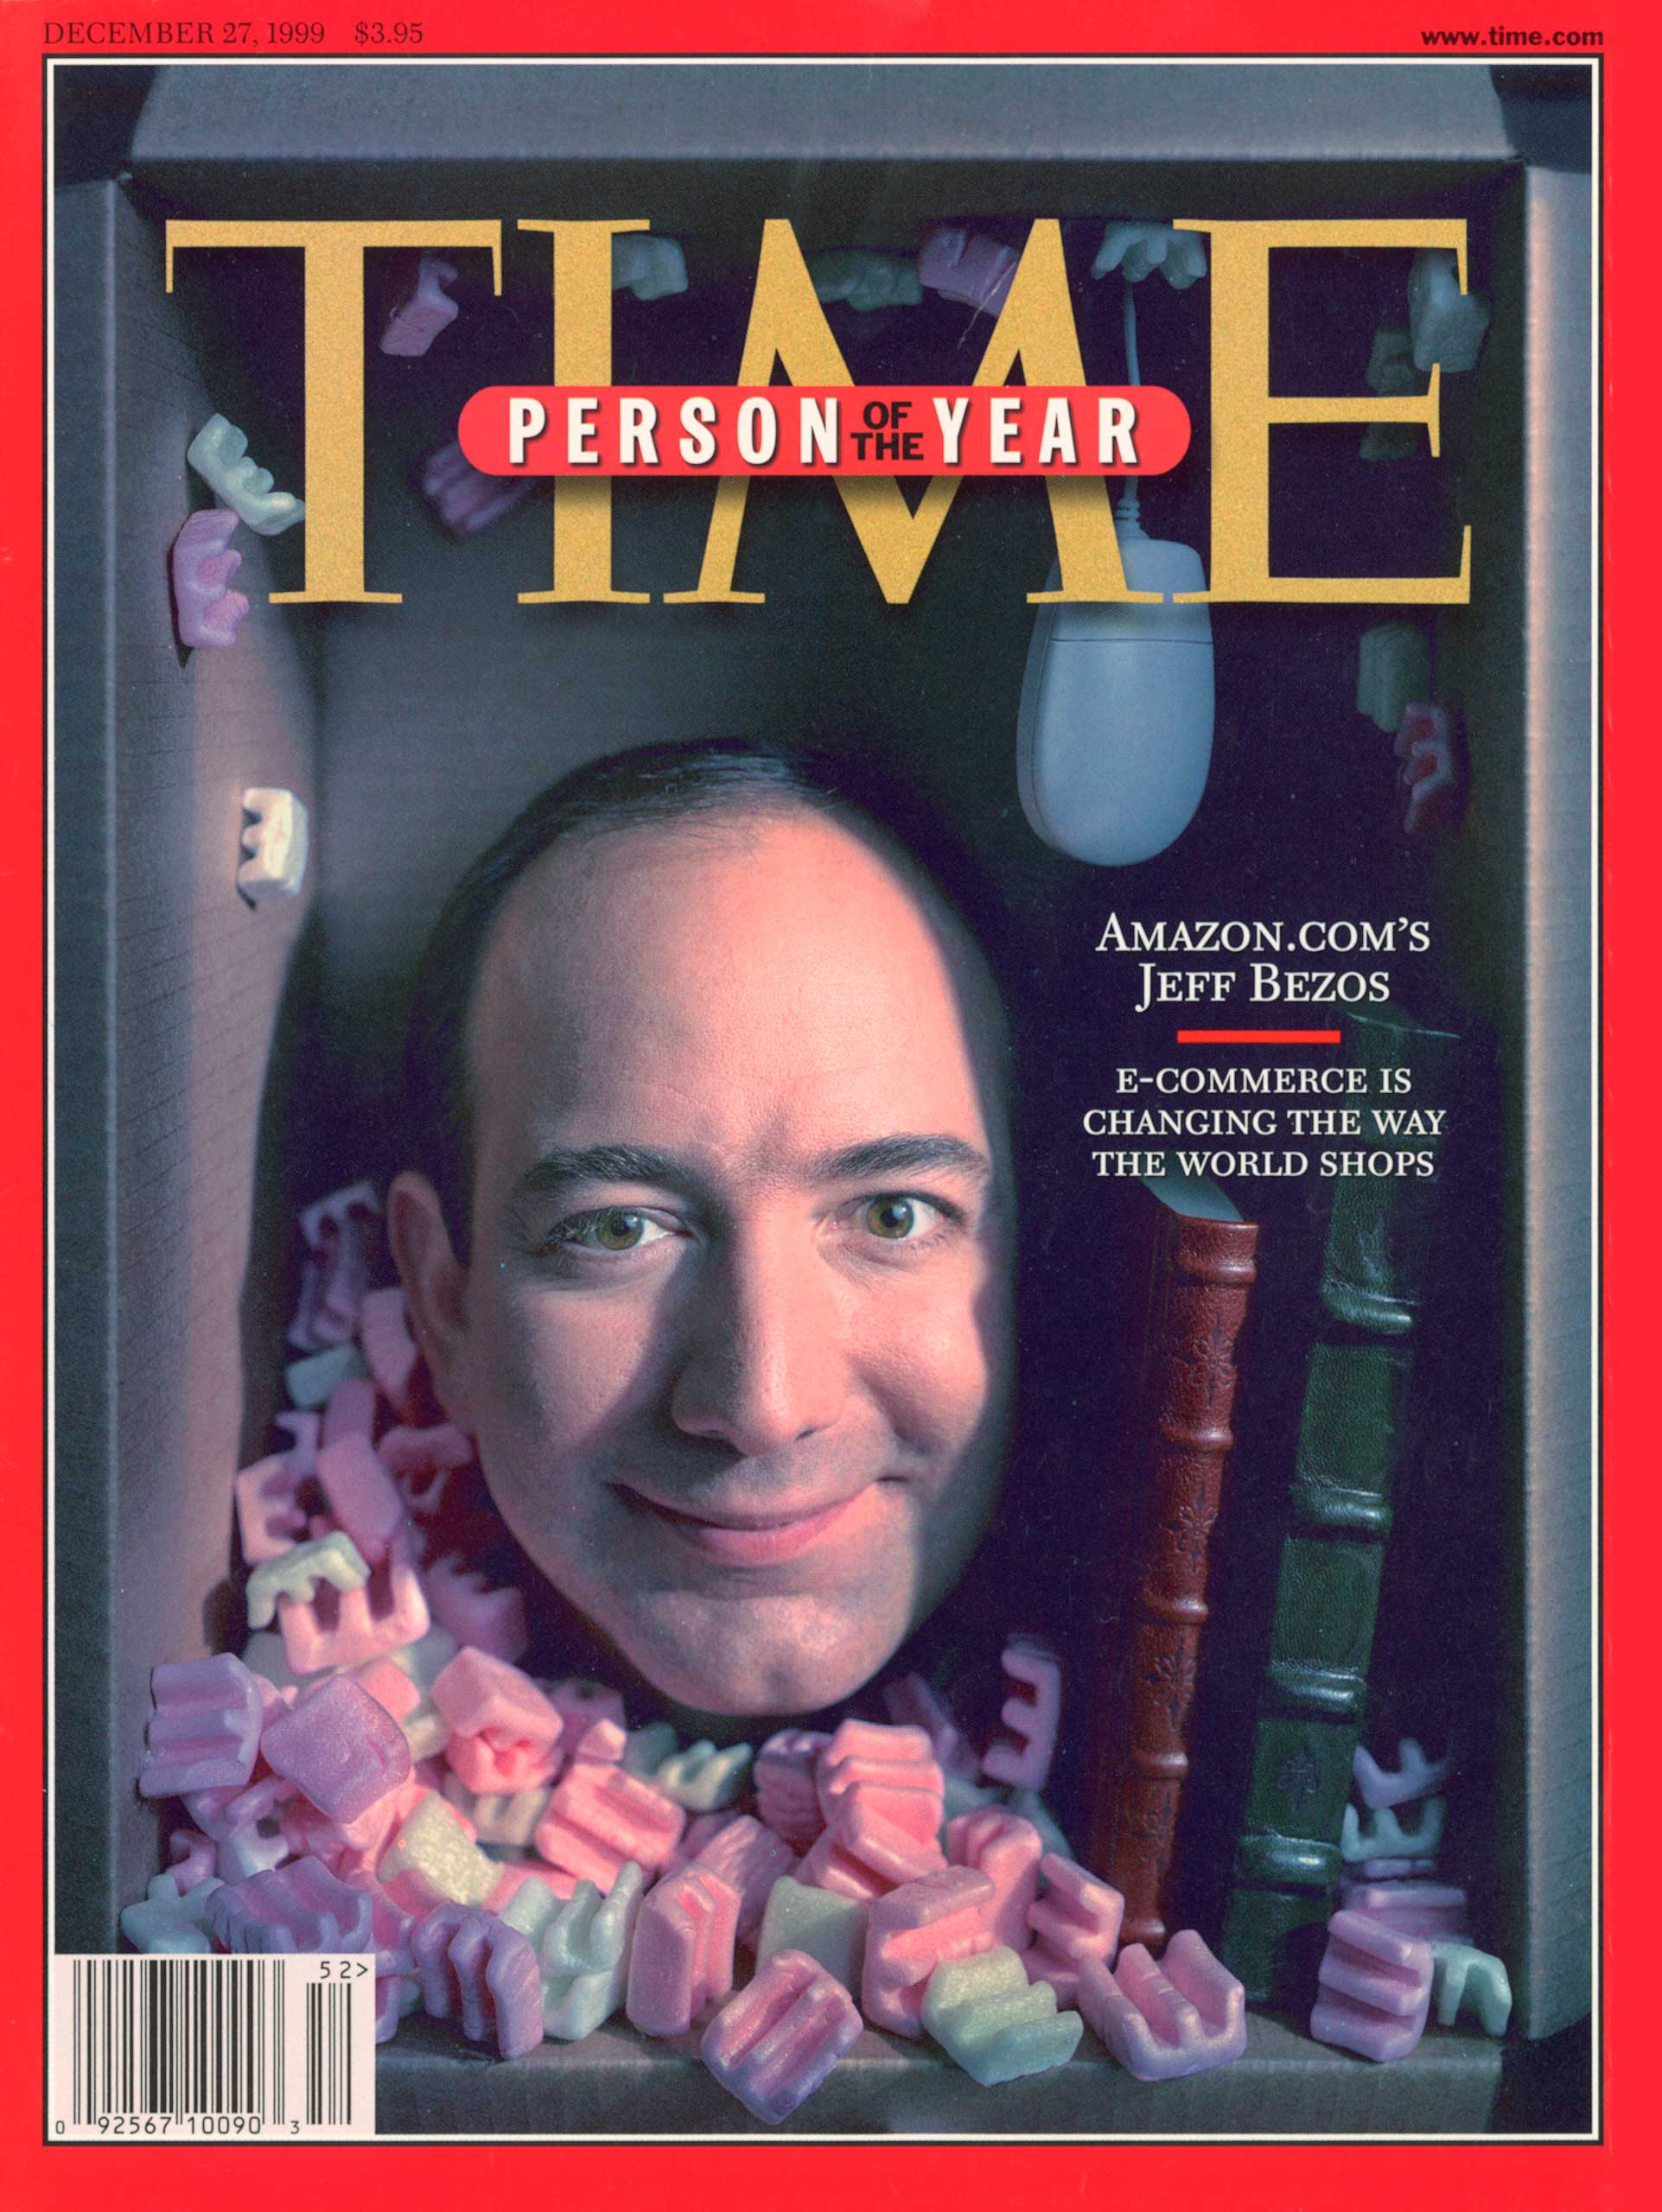 1999: Jeff Bezos